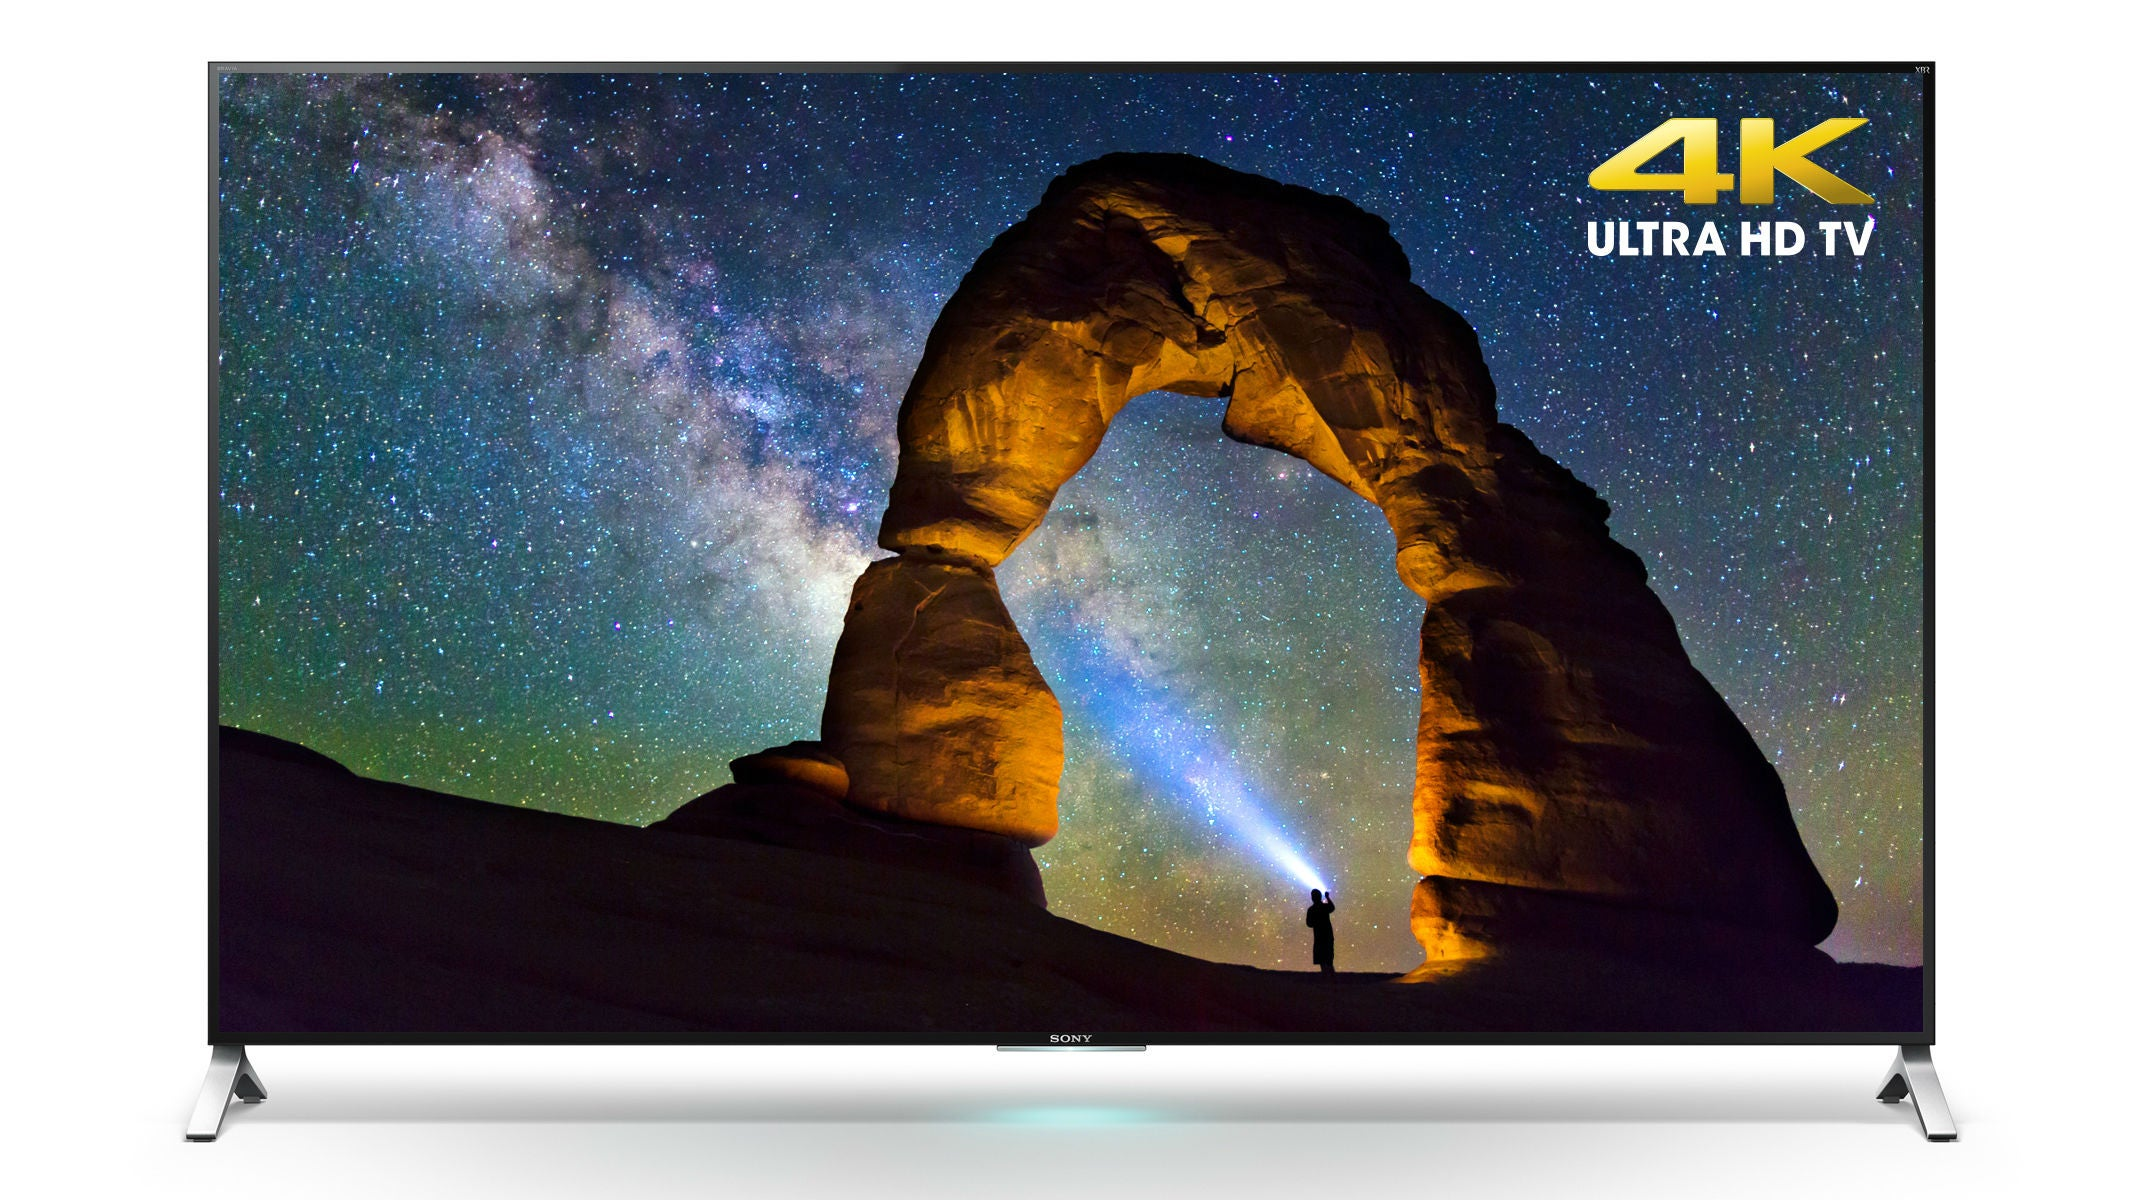 Sony's New UHD TVs Will Run On Android TV